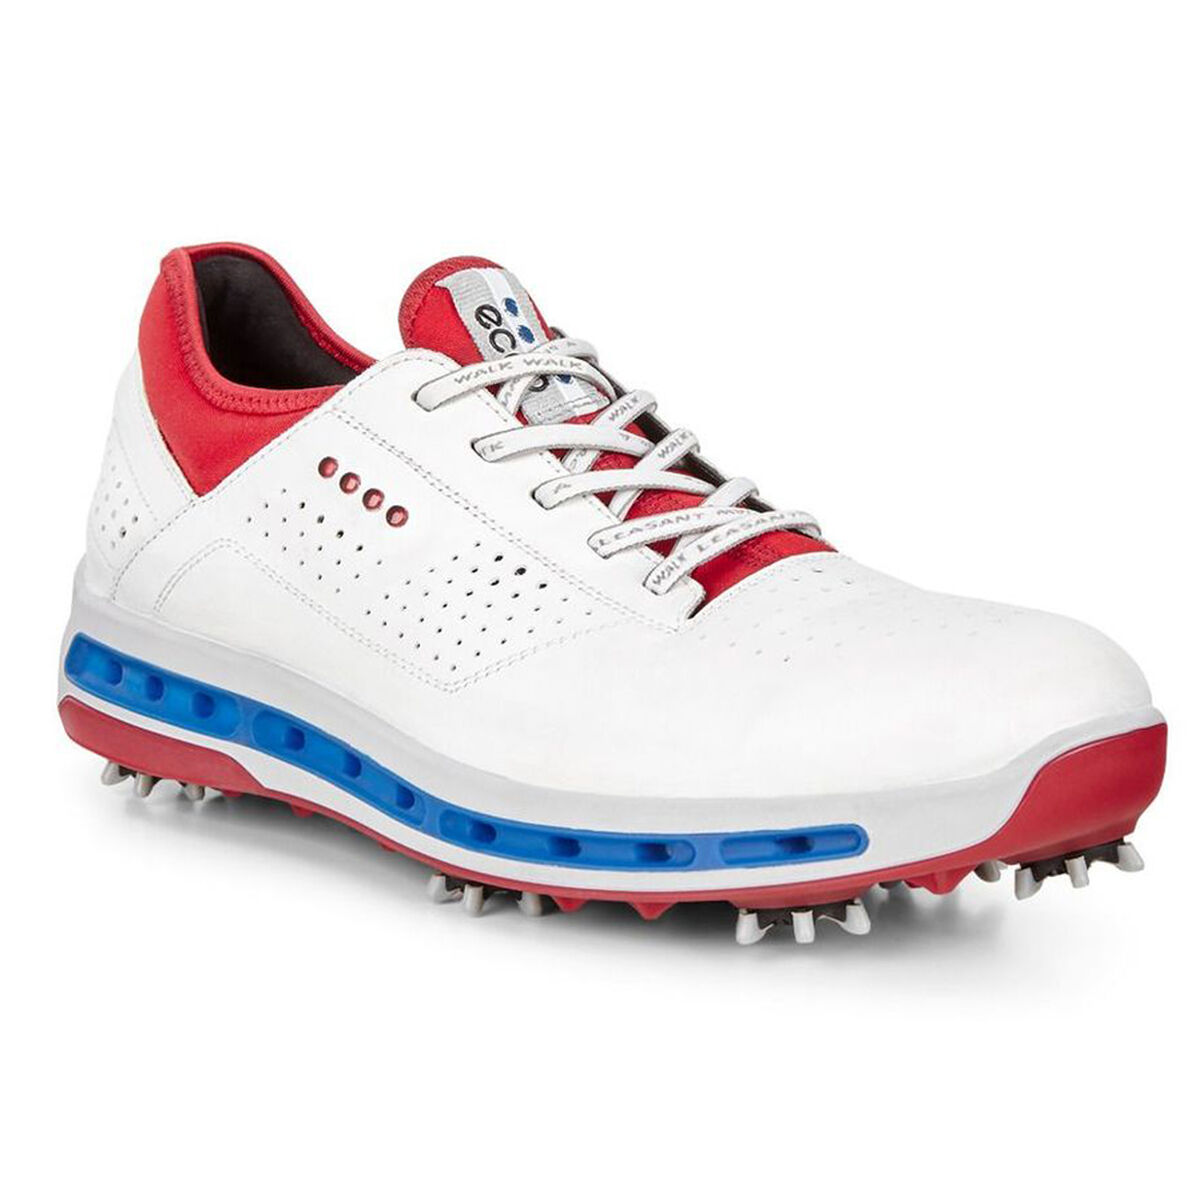 1e9f86234406 ECCO Cool 18 GTX Men s Golf Shoe - Red White Blue